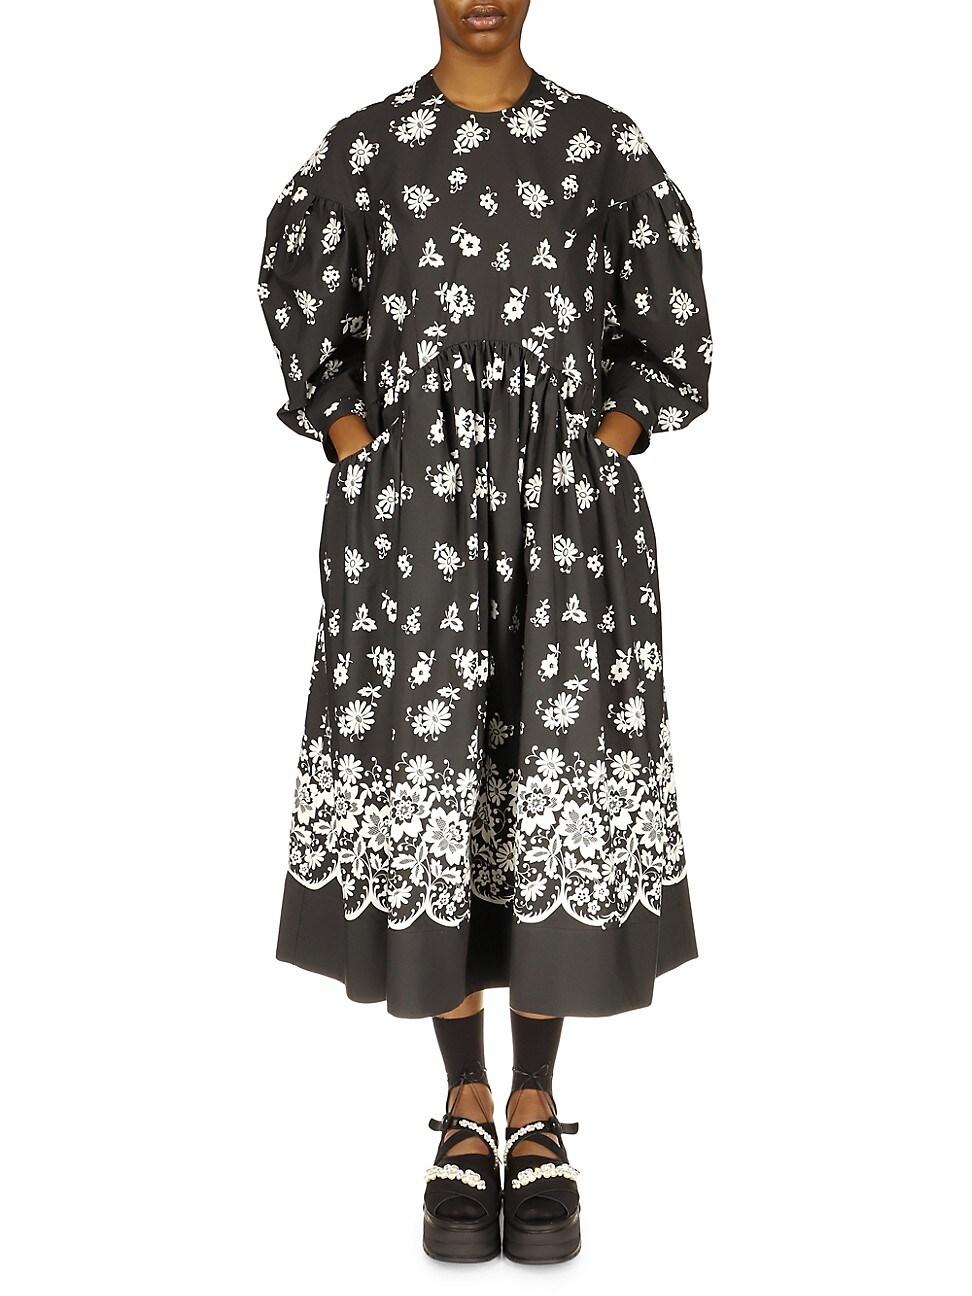 Simone Rocha WOMEN'S DROP POCKET PRINTED SMOCK DRESS